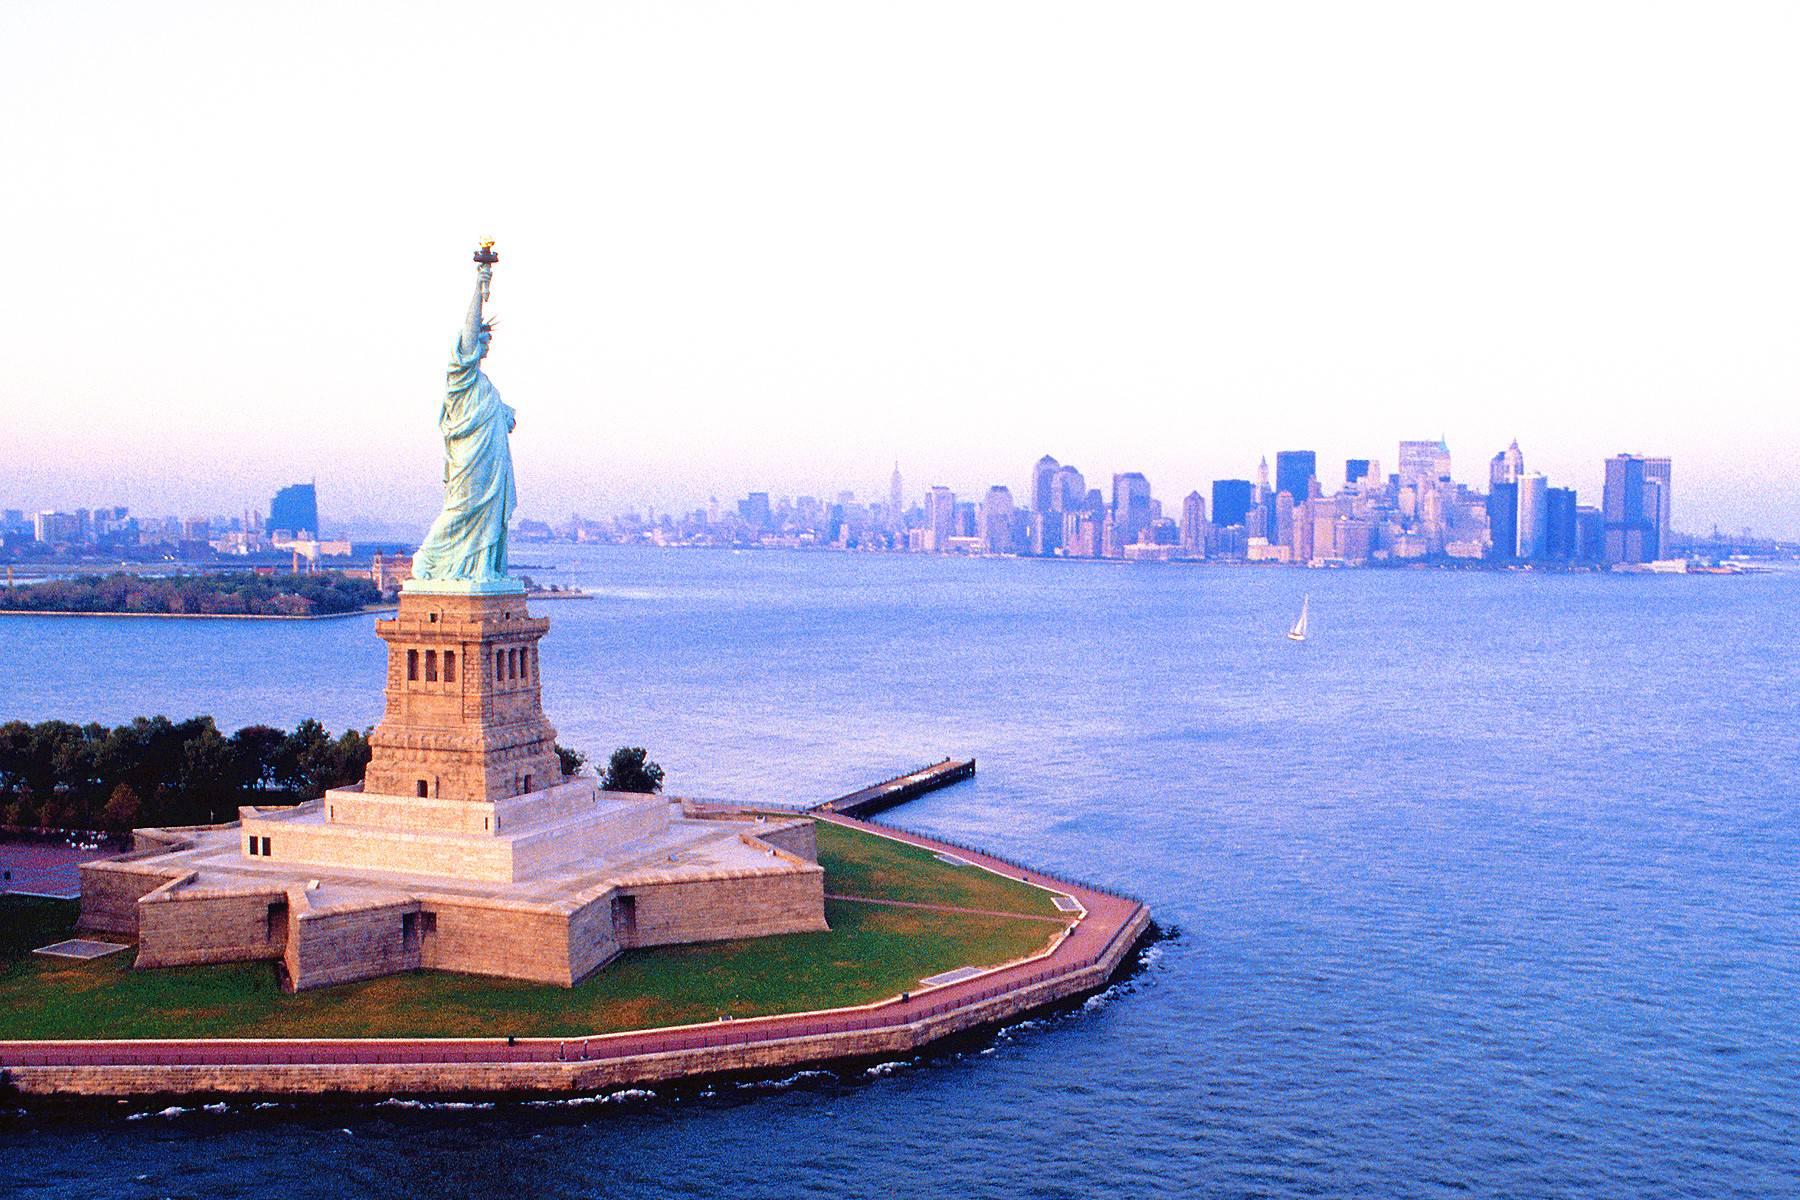 5-Day US East Coast Tour From New York: Philadelphia, Washington, D.C., Niagara Falls and Boston